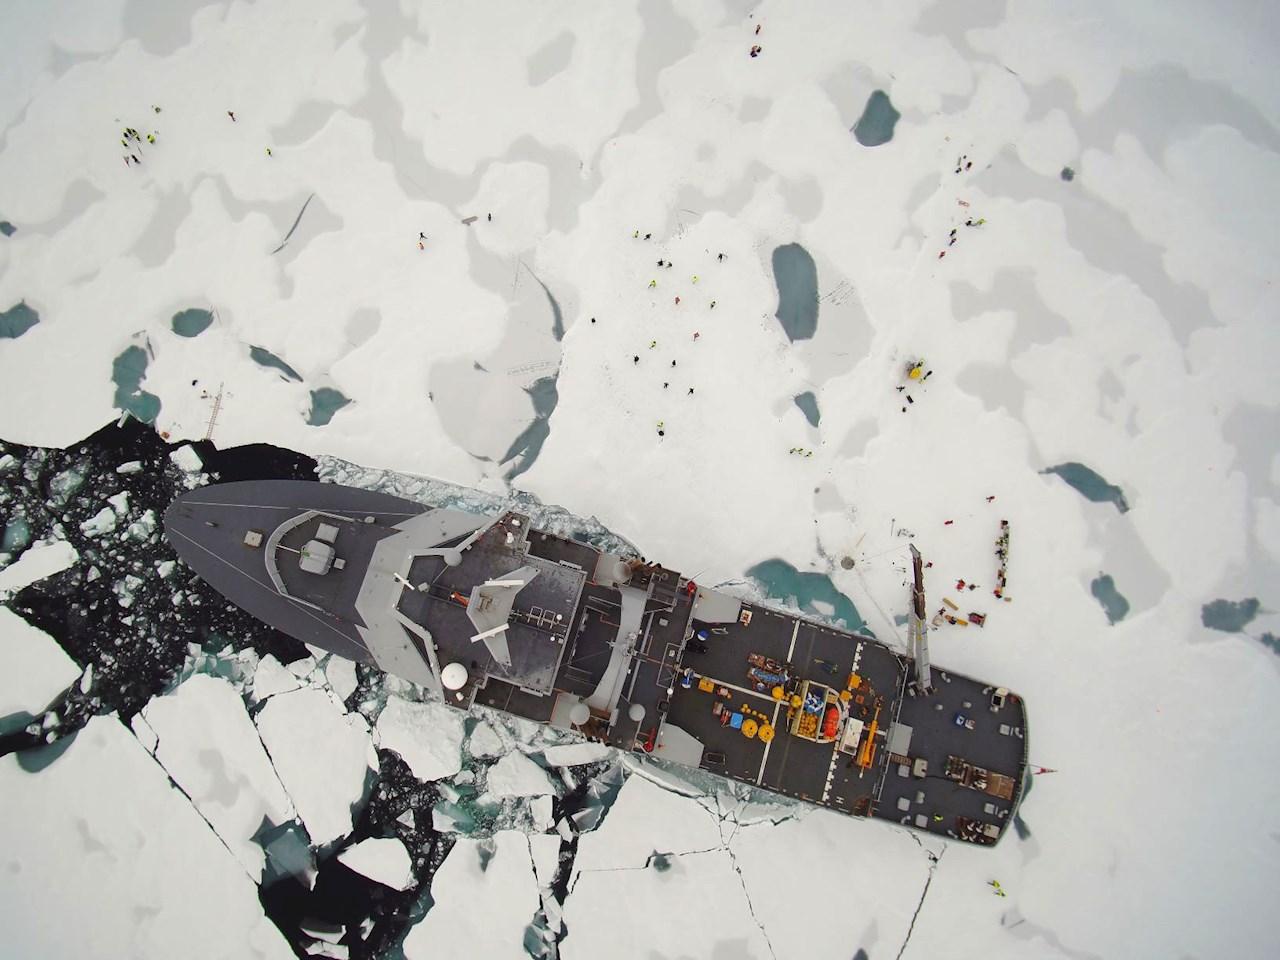 KV Svalbard am Nordpol